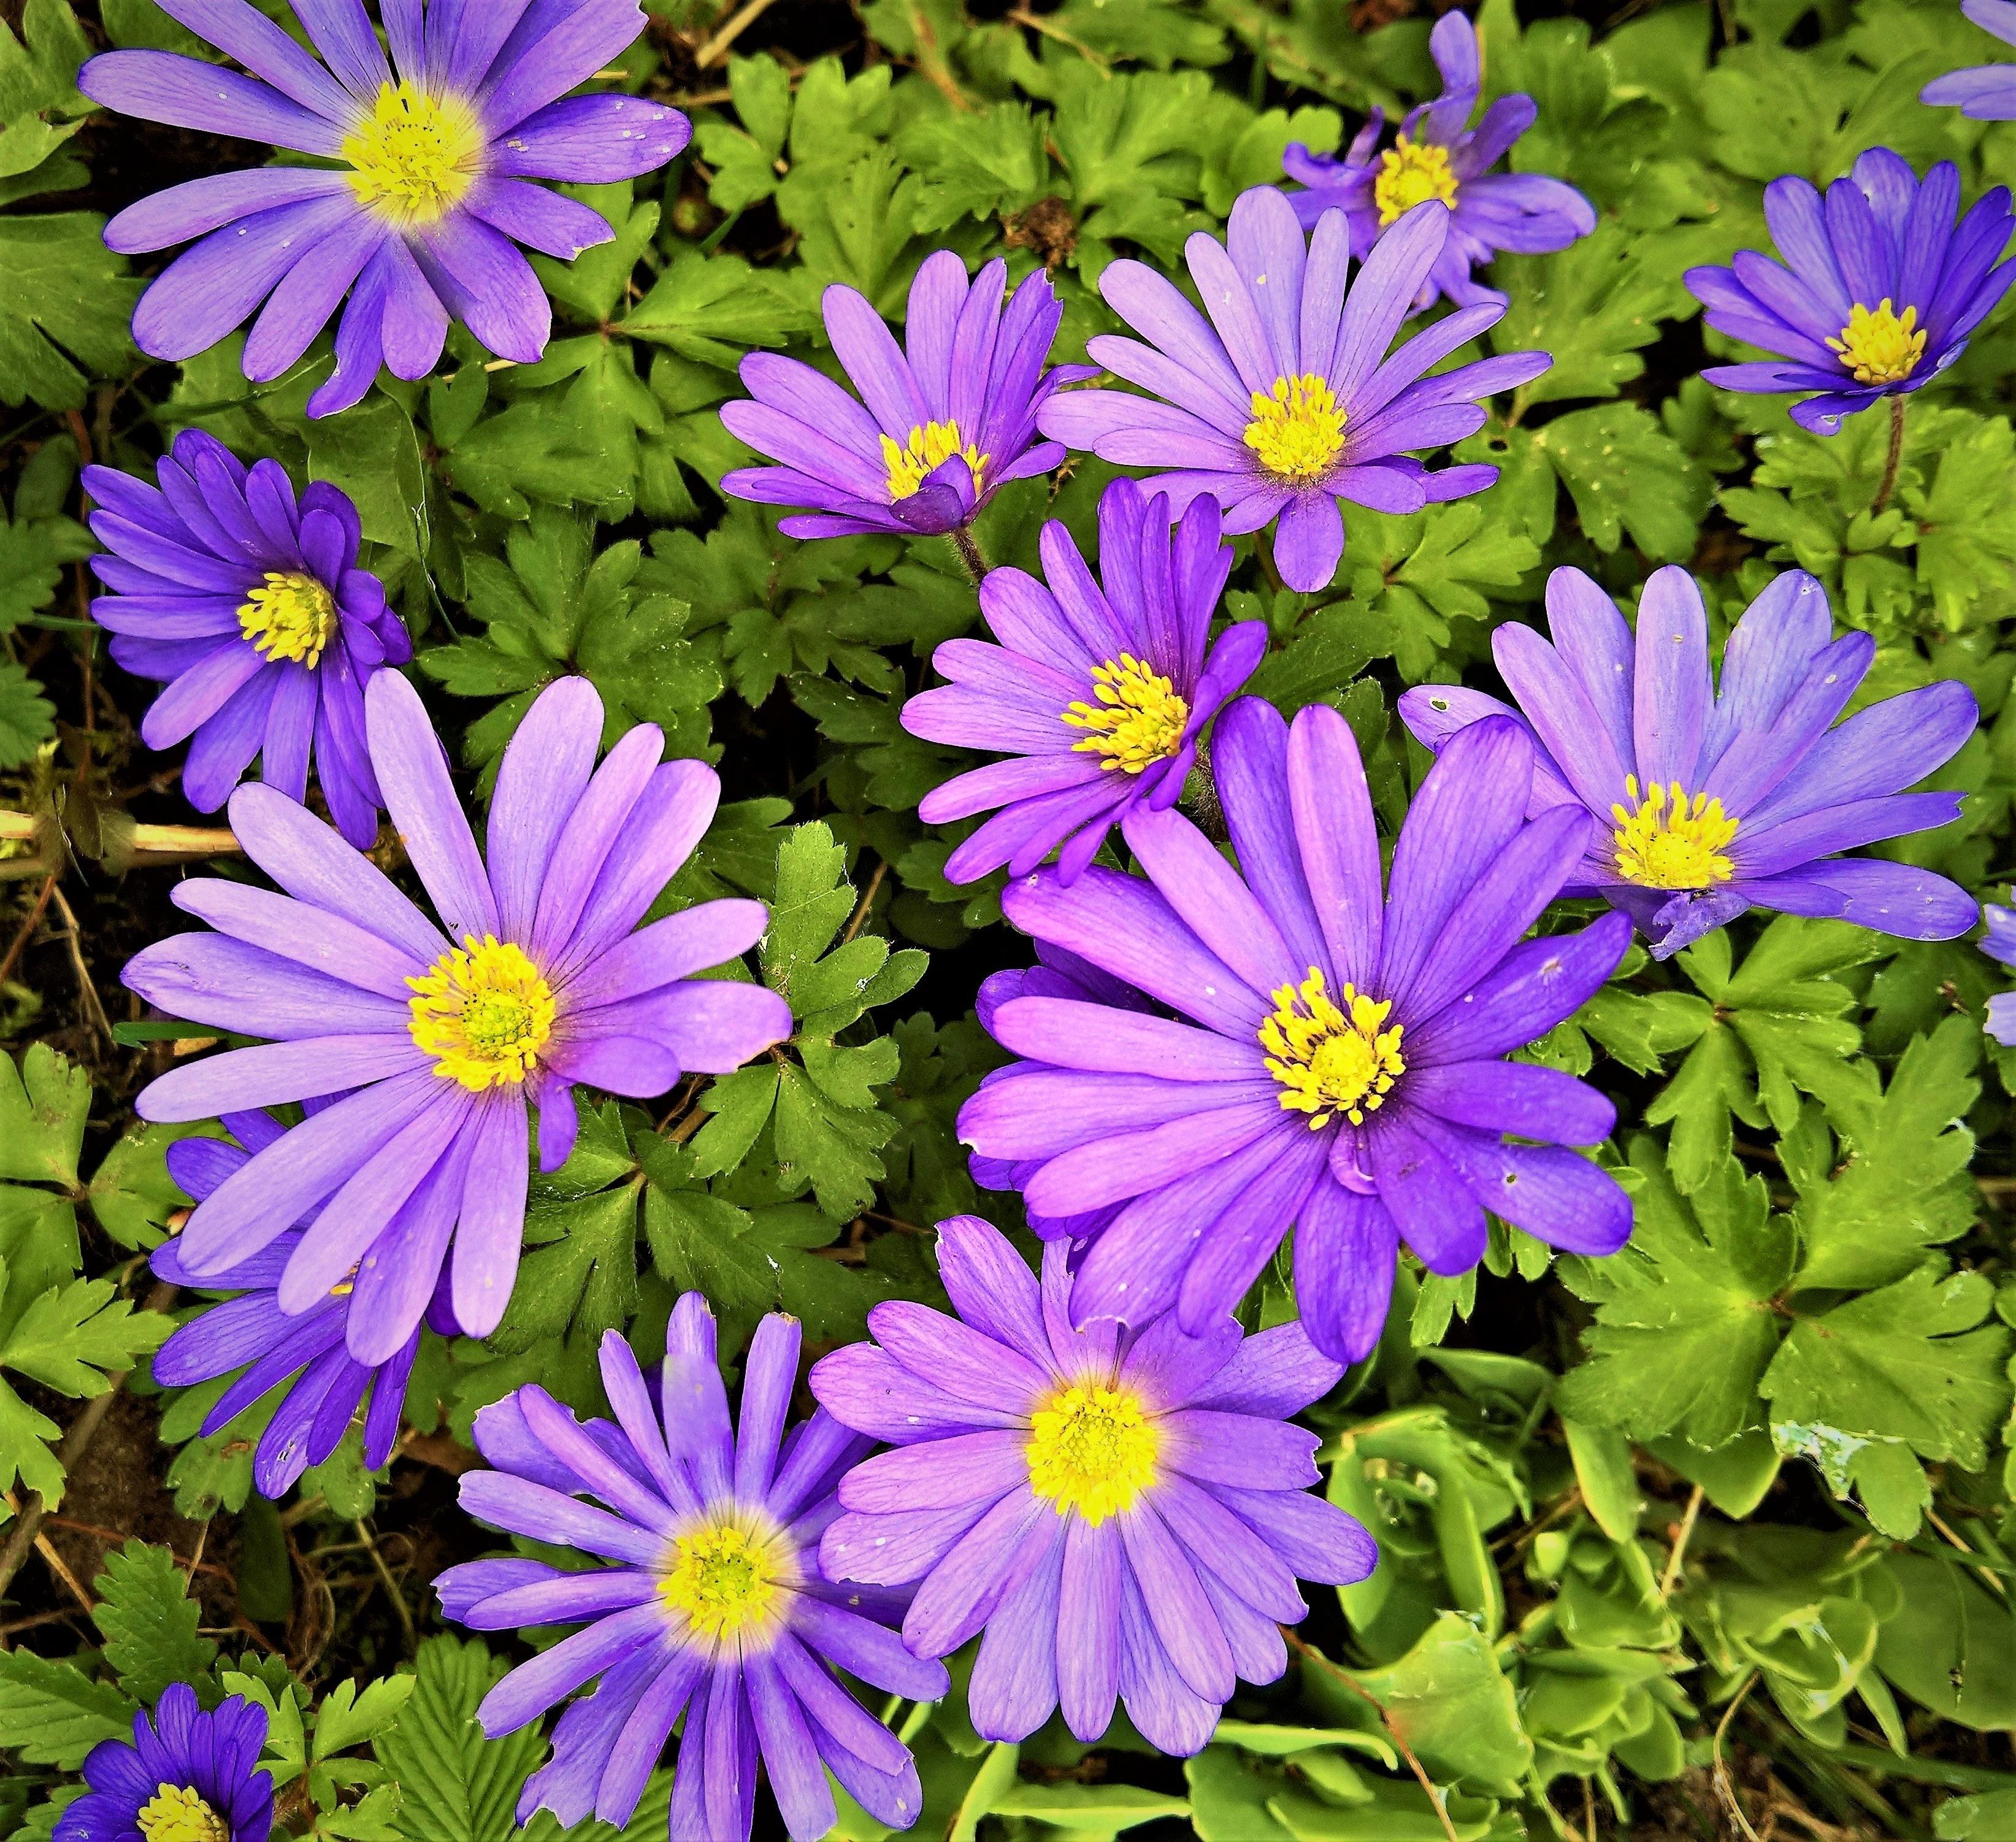 Free stock photo of anemone blanda balkan anemone blue violet flowers free download izmirmasajfo